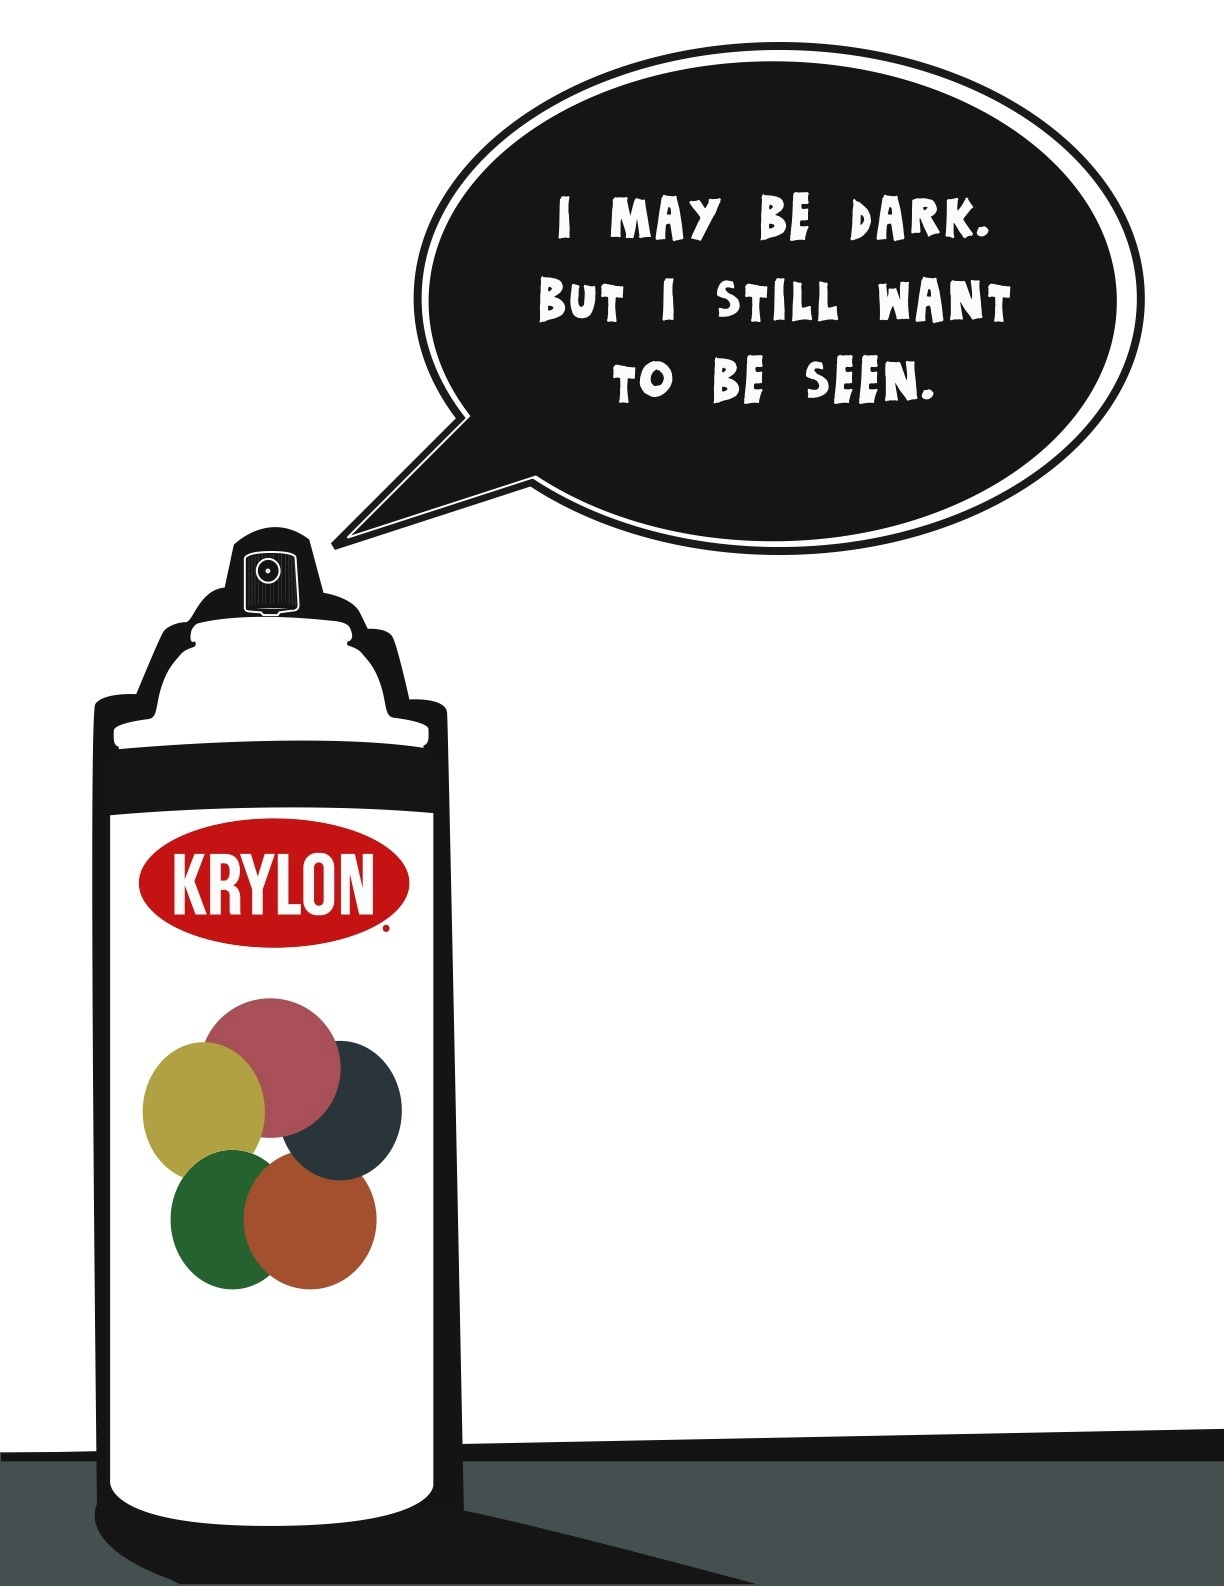 krylon-black